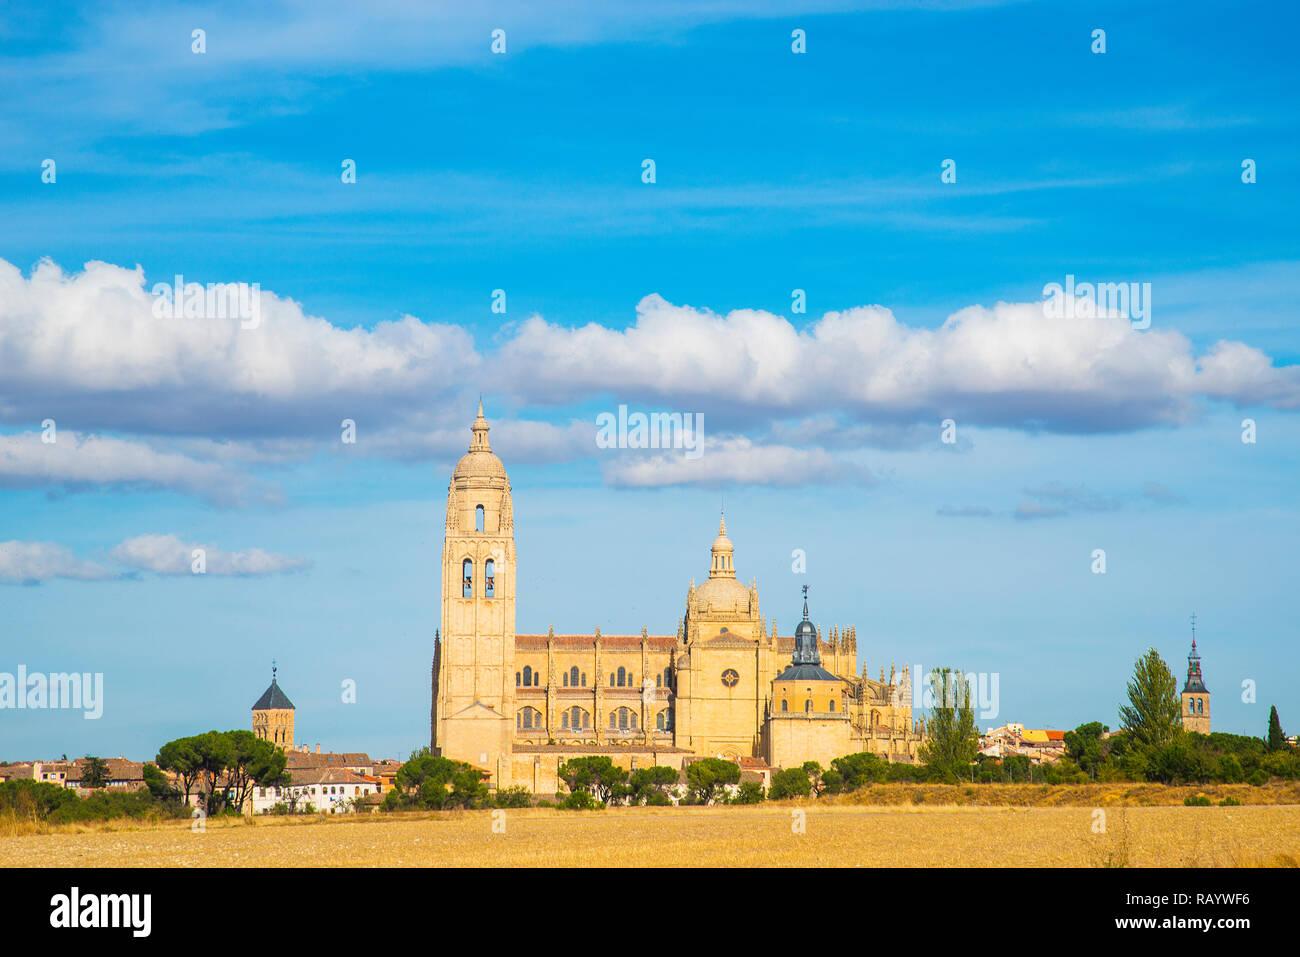 Cathedral. Segovia, Spain. - Stock Image